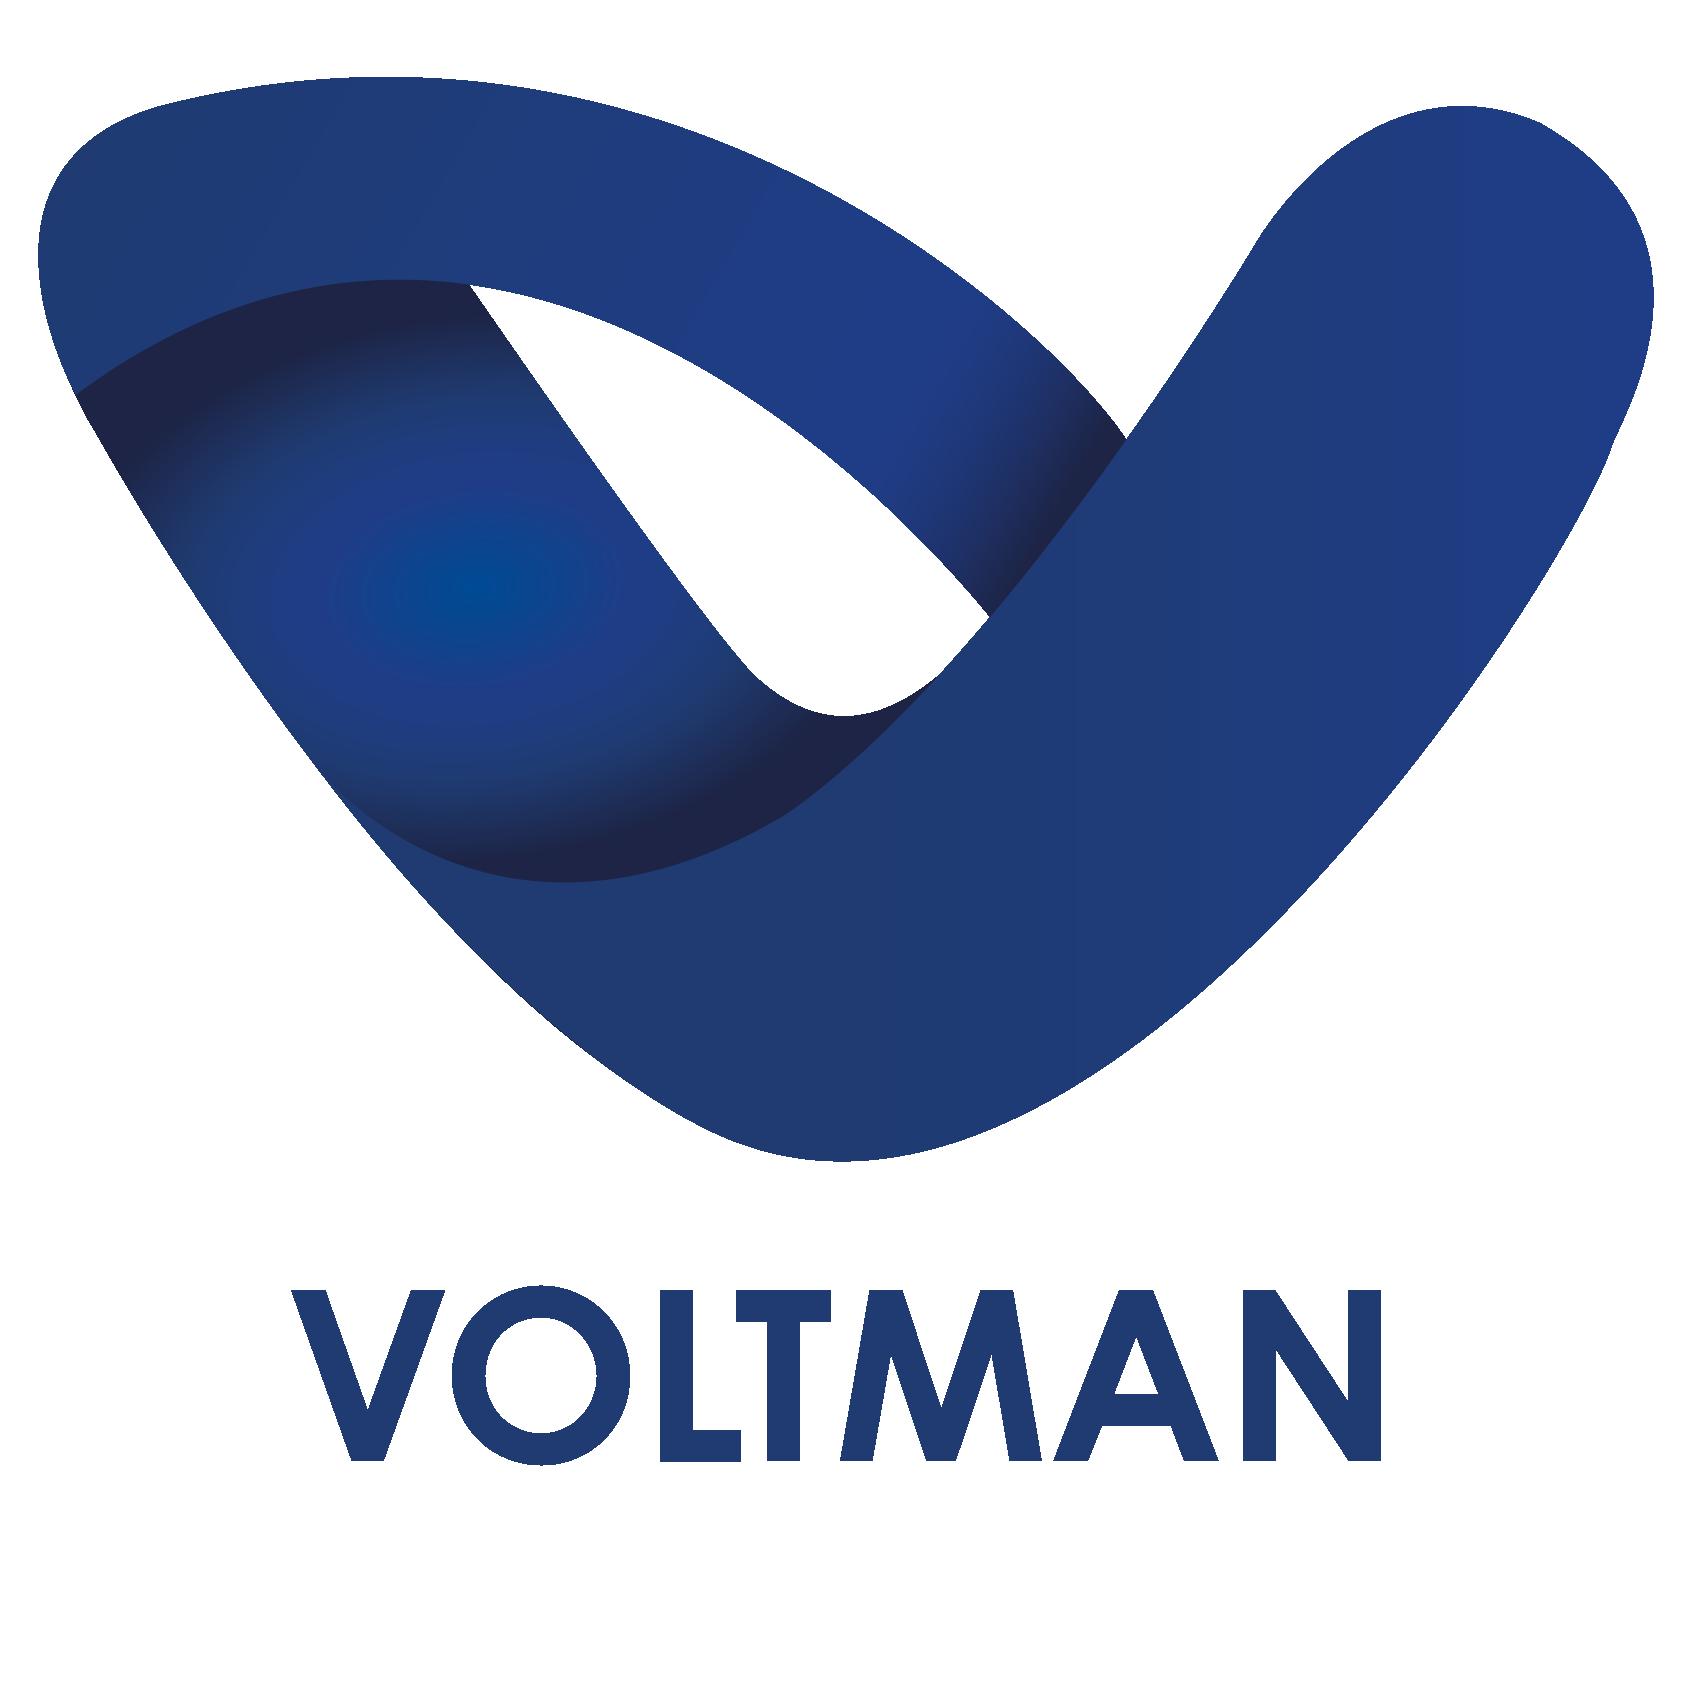 VOLTMAN_RVB